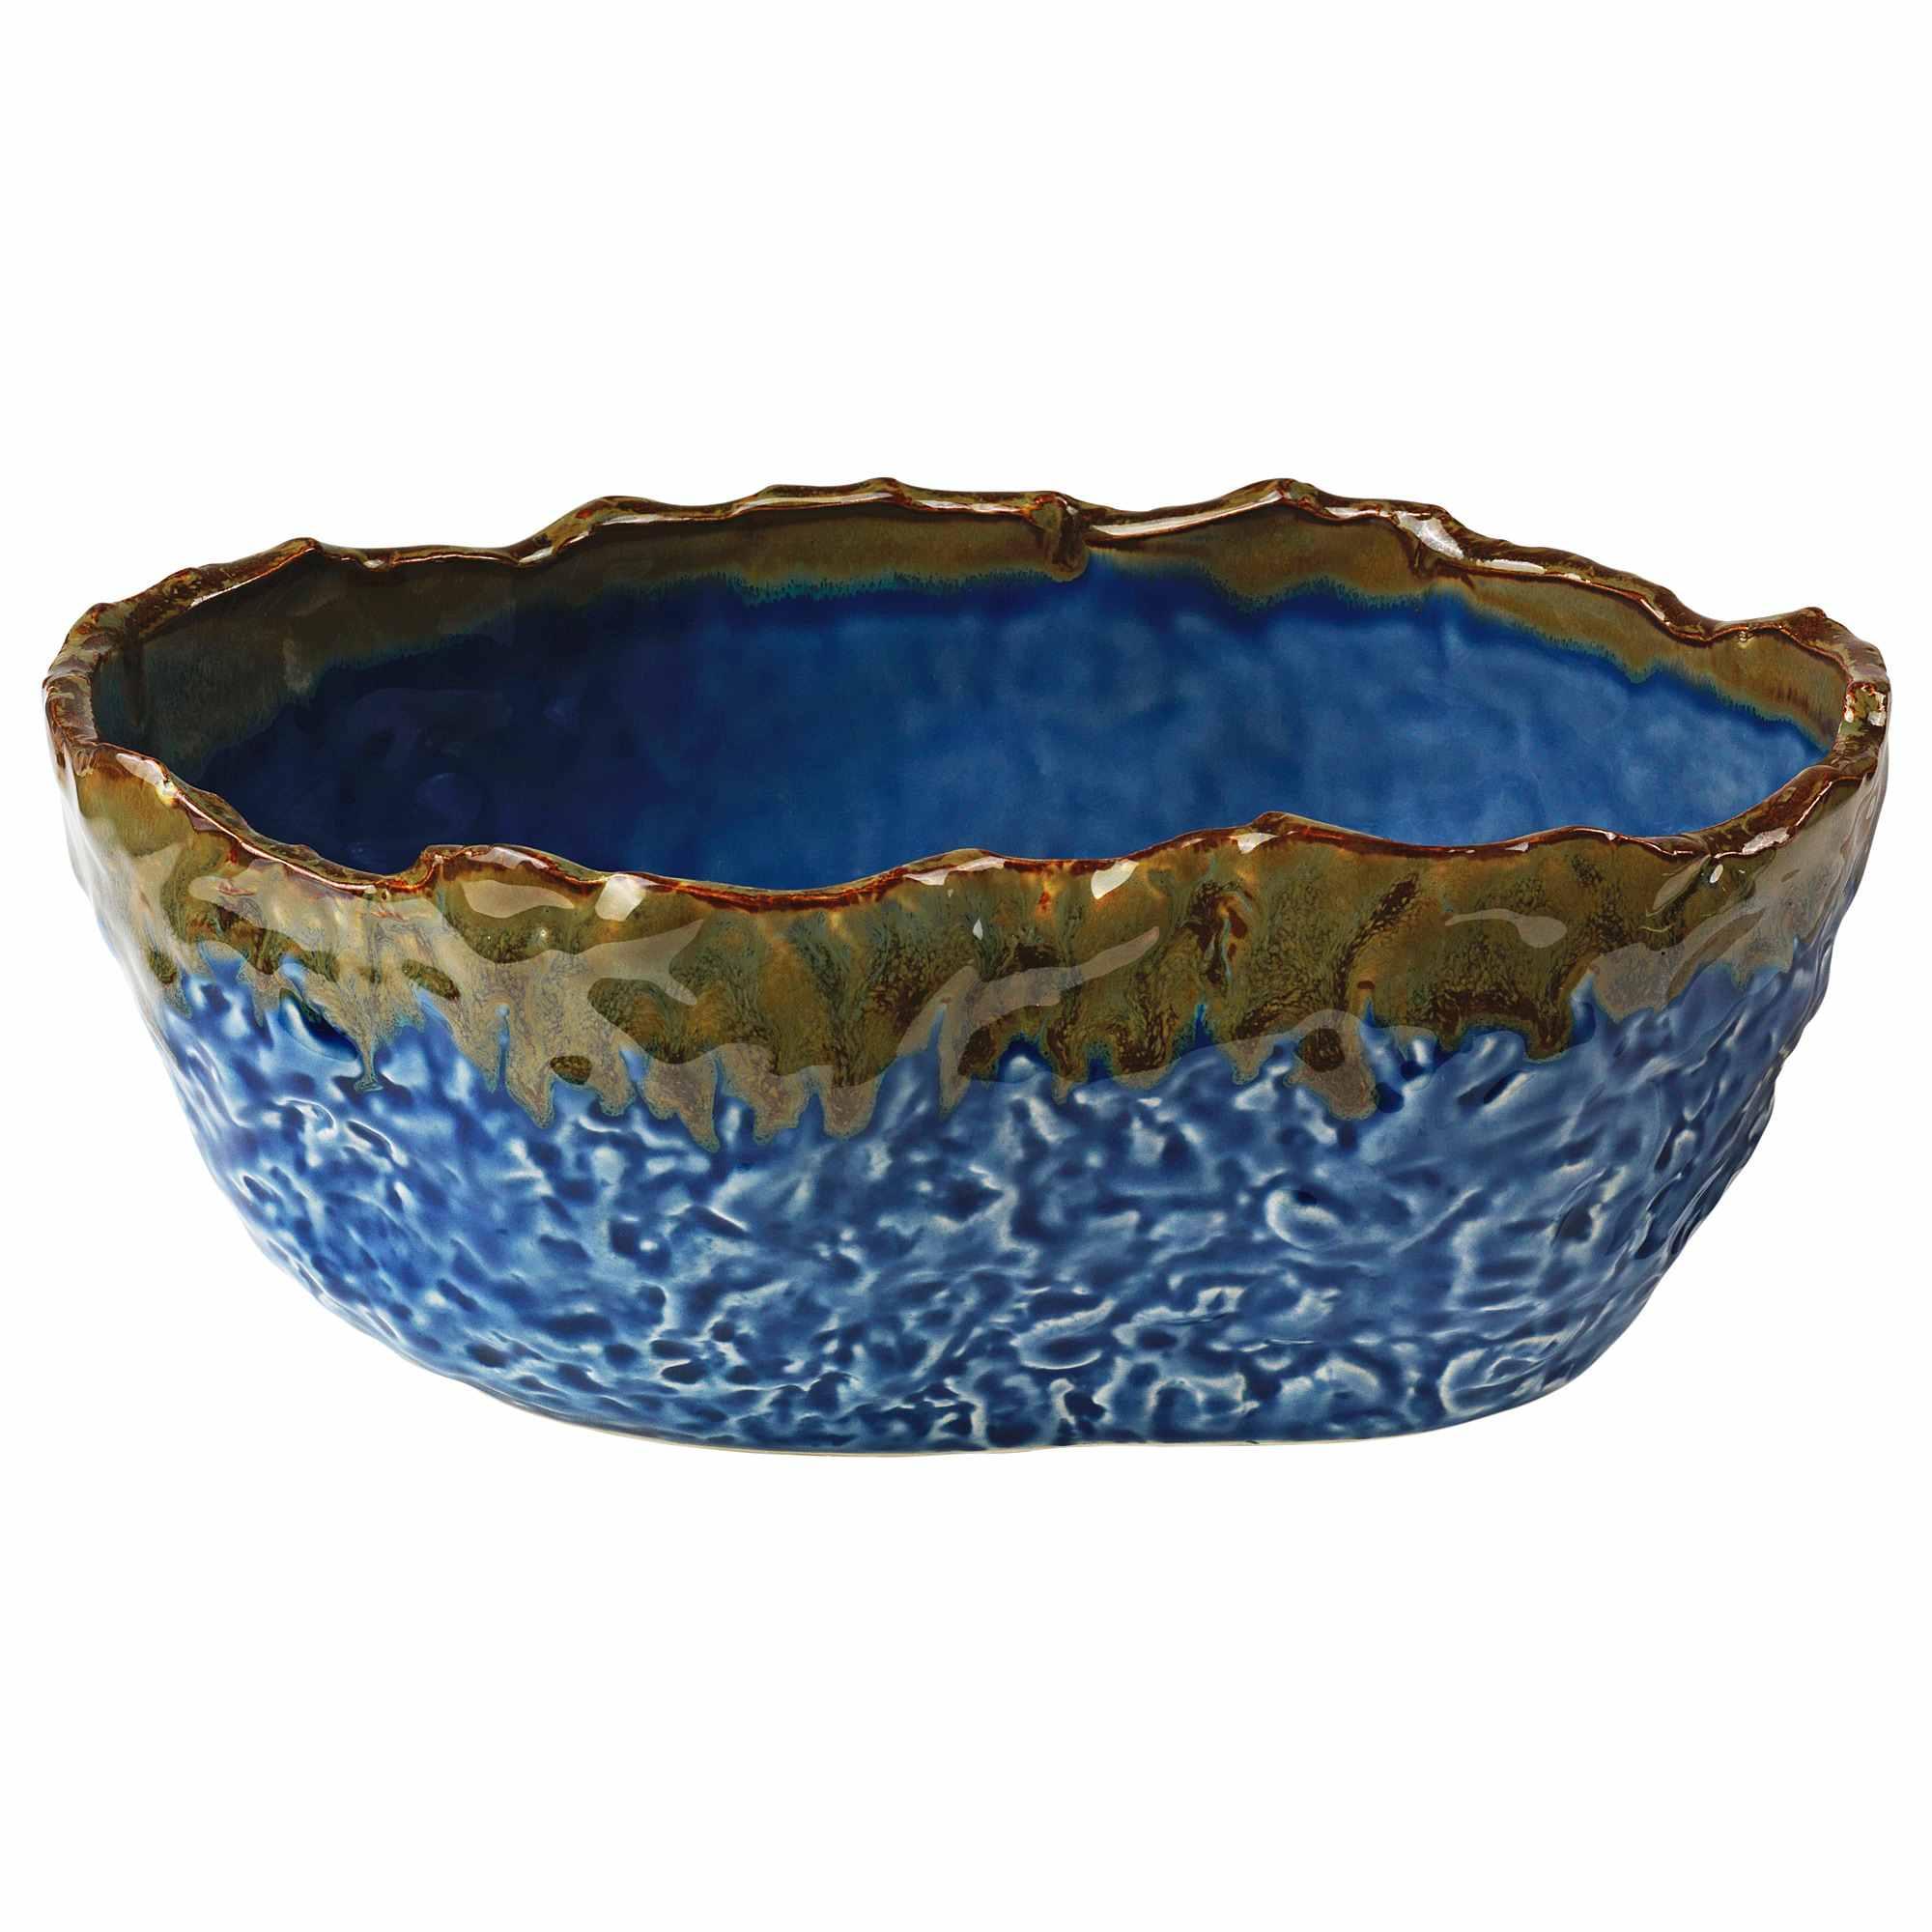 ANNANSTANS Handmade Bowl